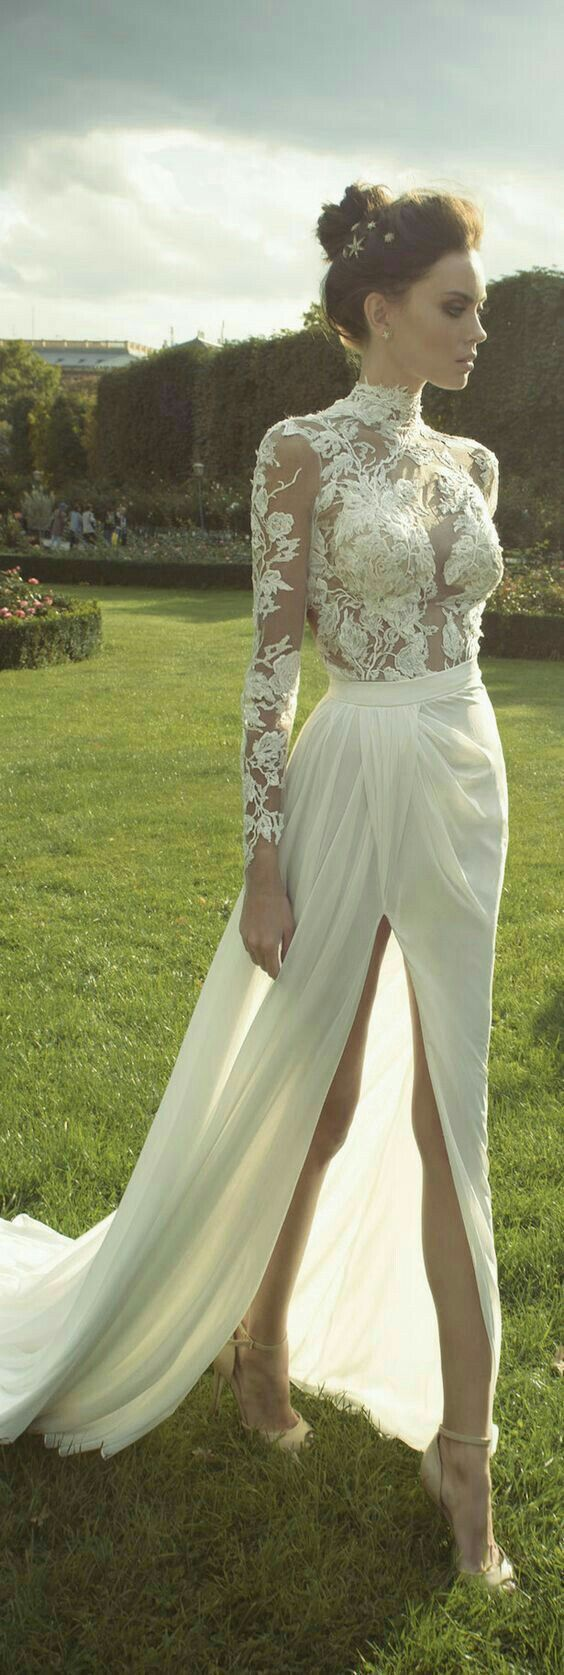 best wedding dresses images on pinterest bachelorette party